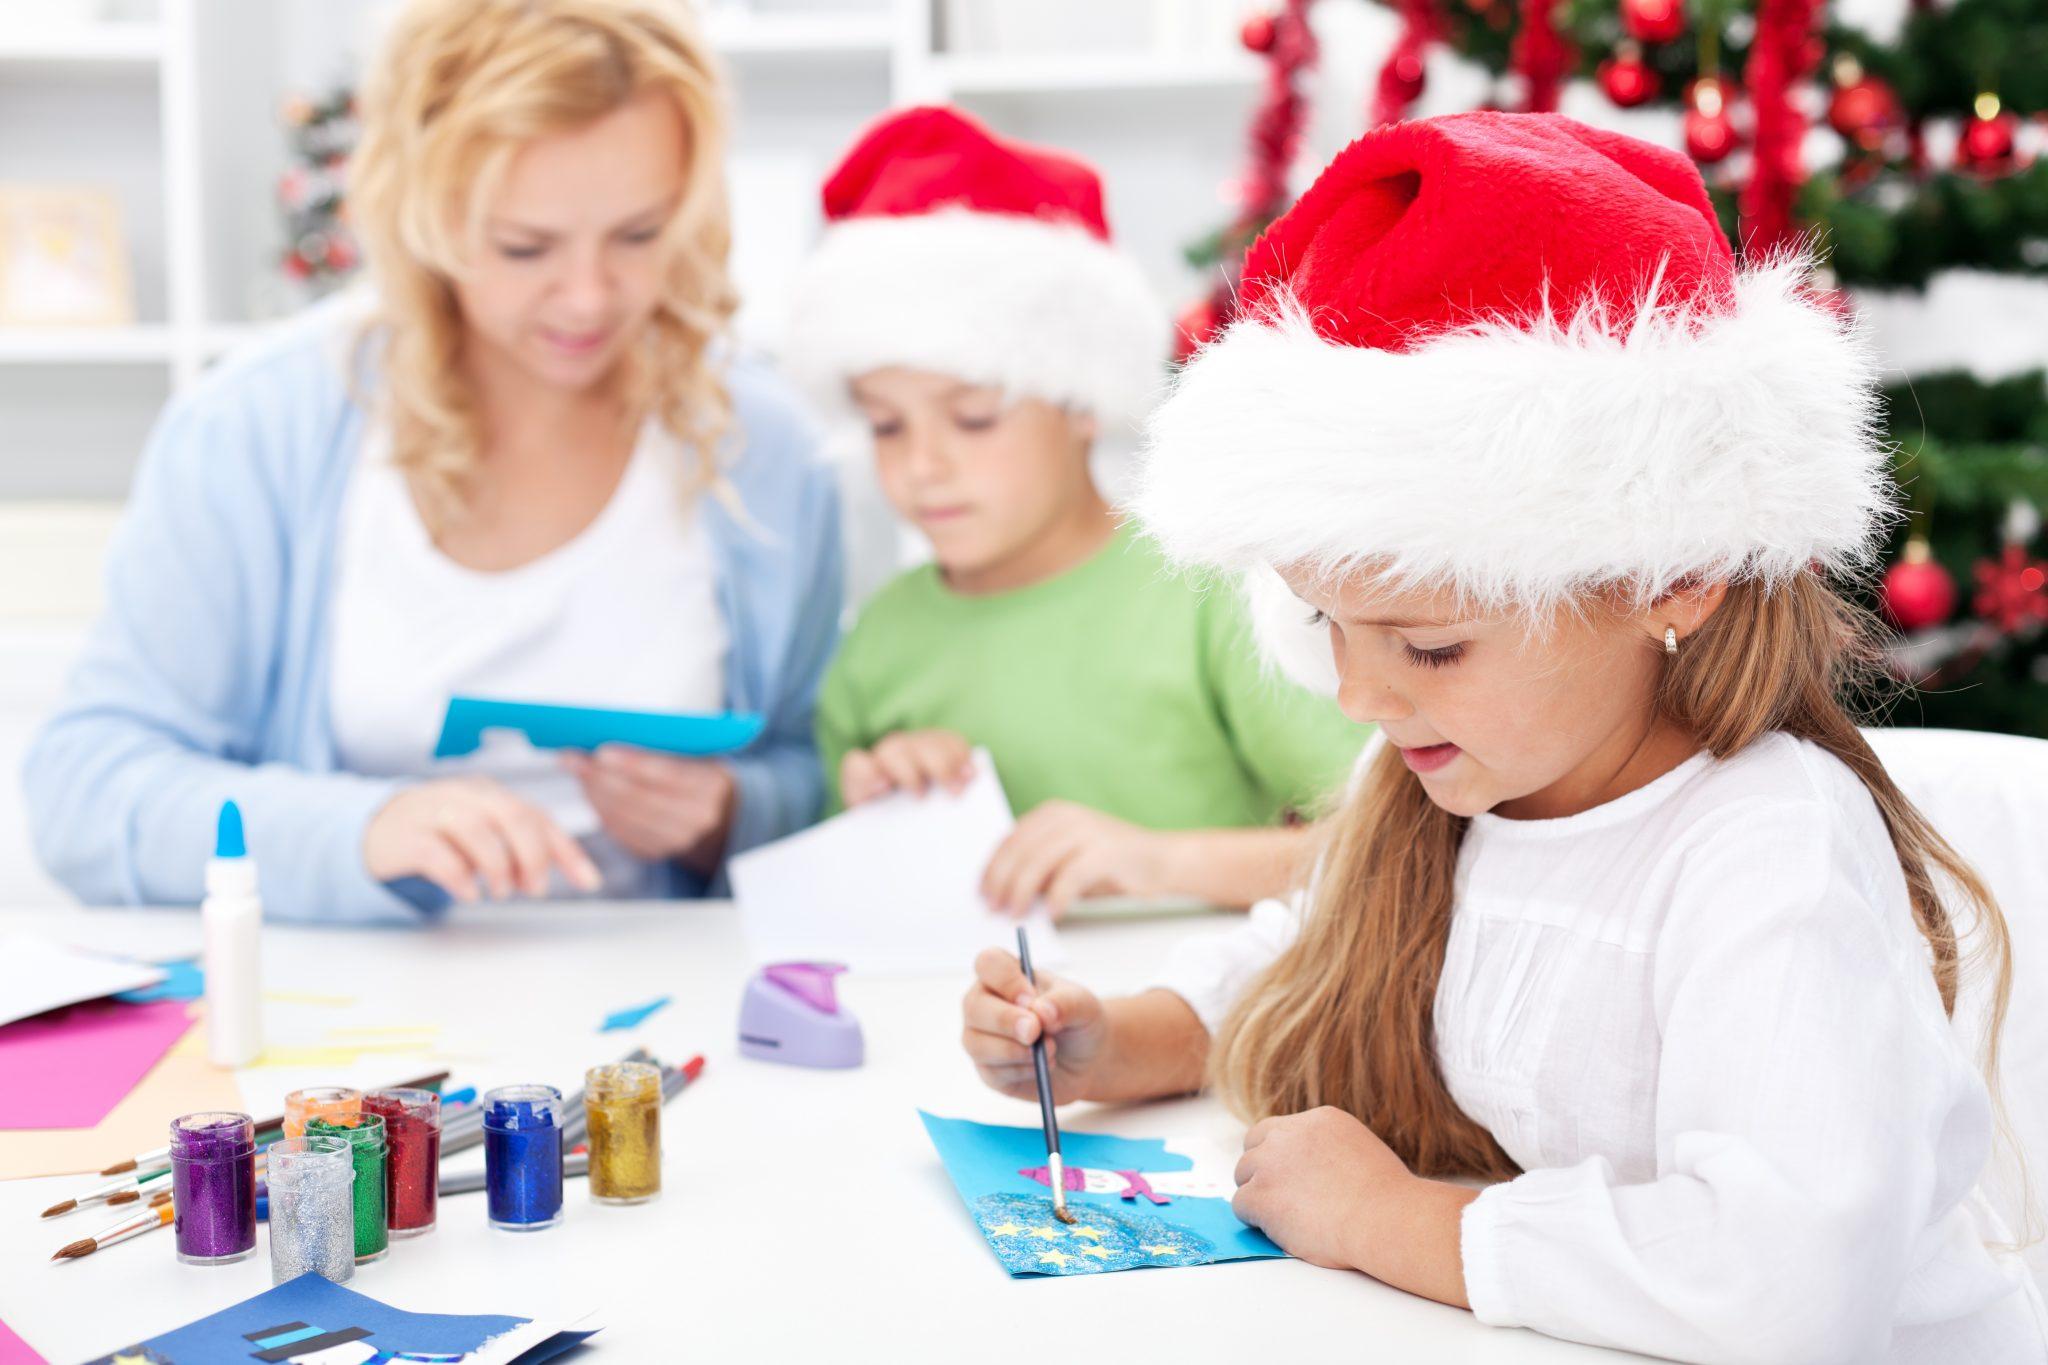 Children Christmas Party Ideas.Childrens Christmas Party Ideas Annabel Karmel